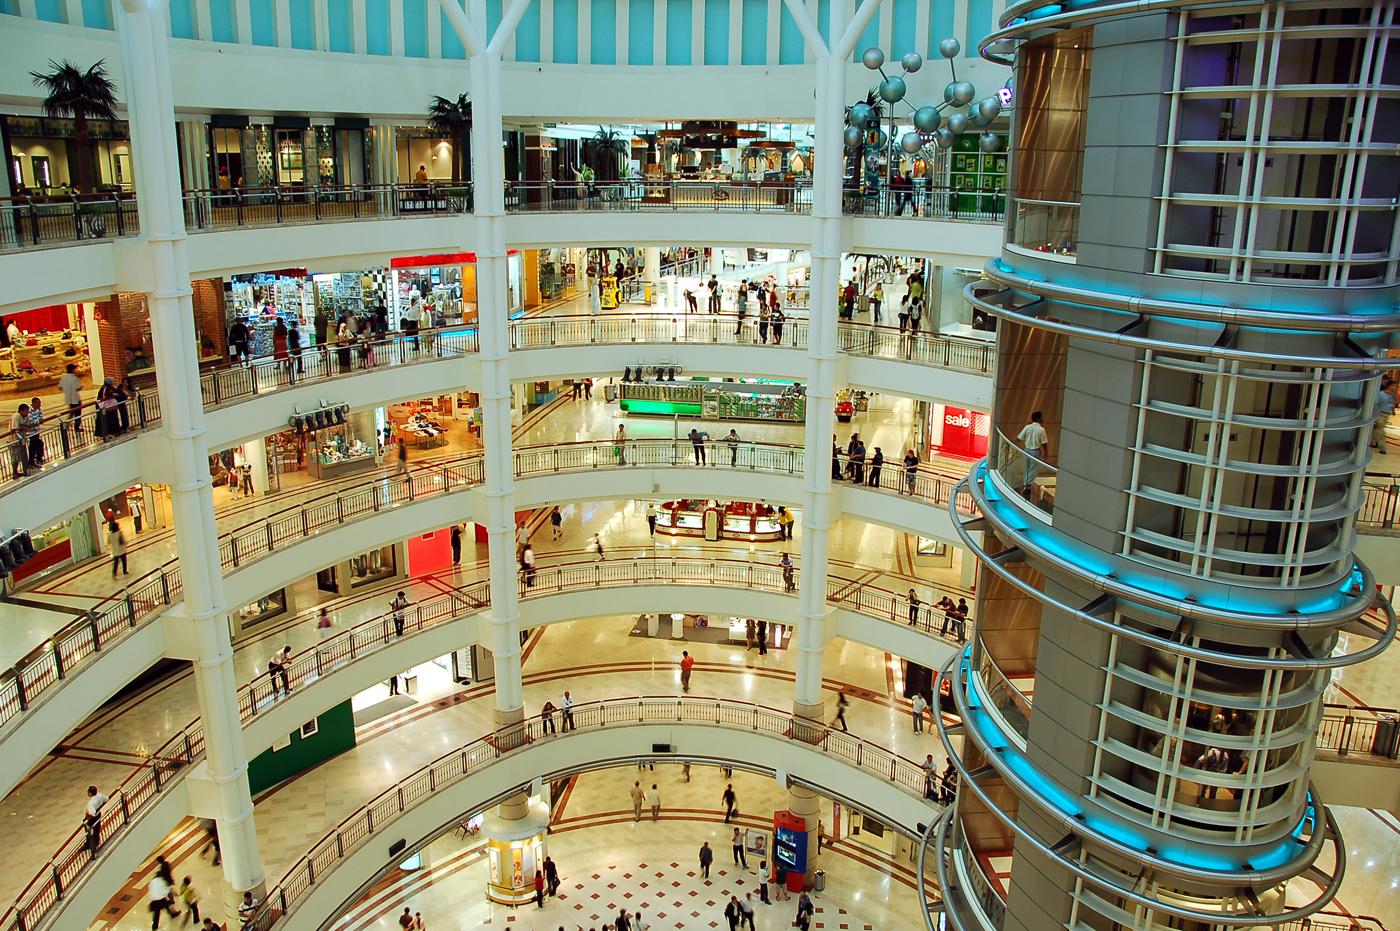 case study 2 mall of america